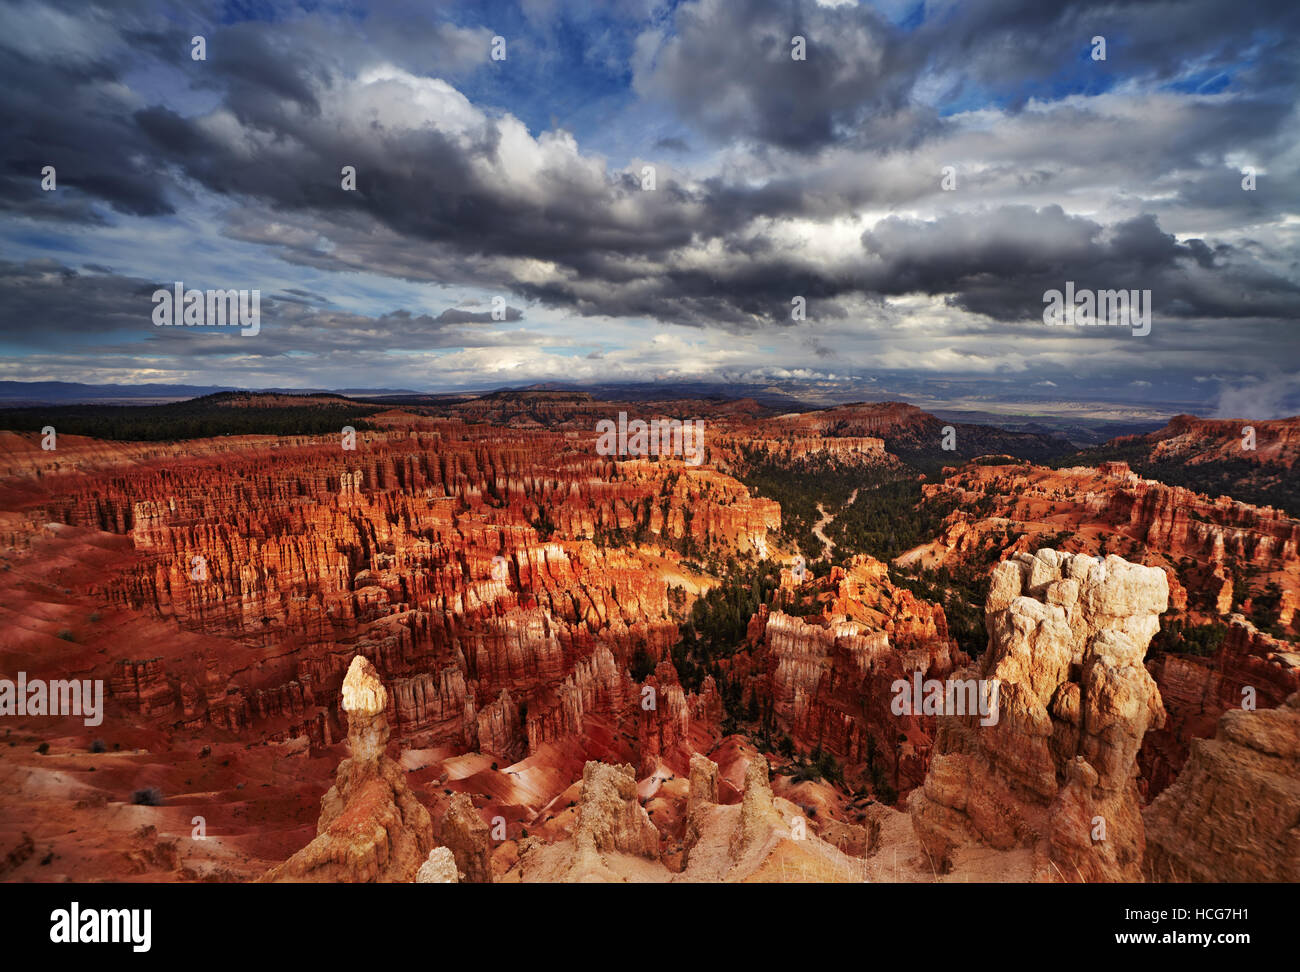 Bryce Canyon, Inspiration Point, Utah, EE.UU. Imagen De Stock